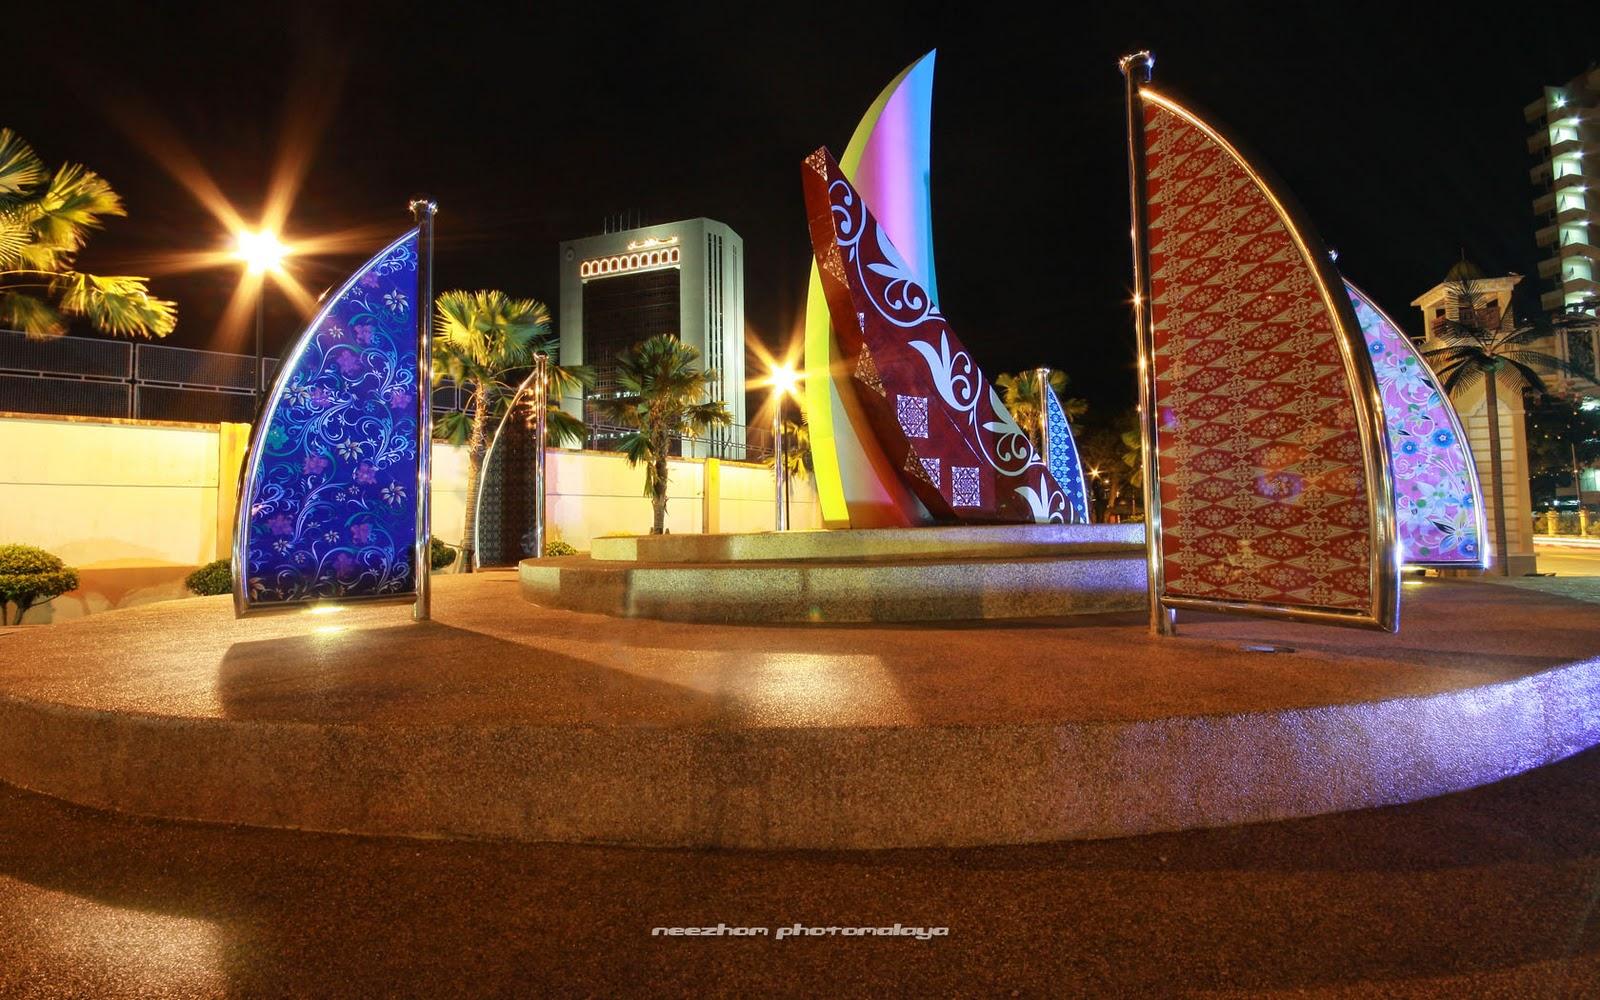 gambar Wisma Darul Iman waktu malam